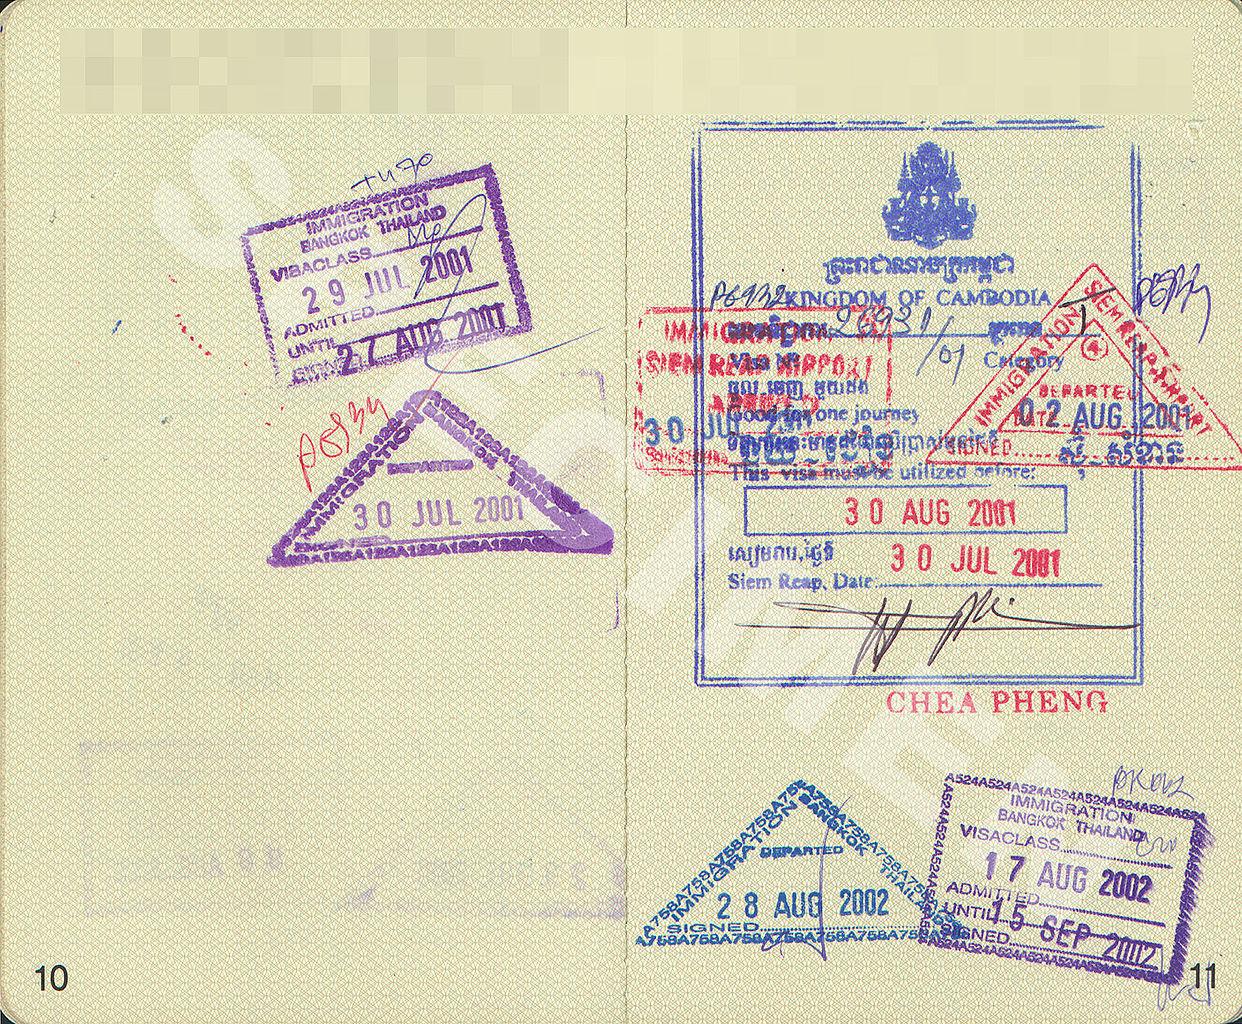 File:Visa kh2001 th2001-2002.jpg - Wikimedia Commons